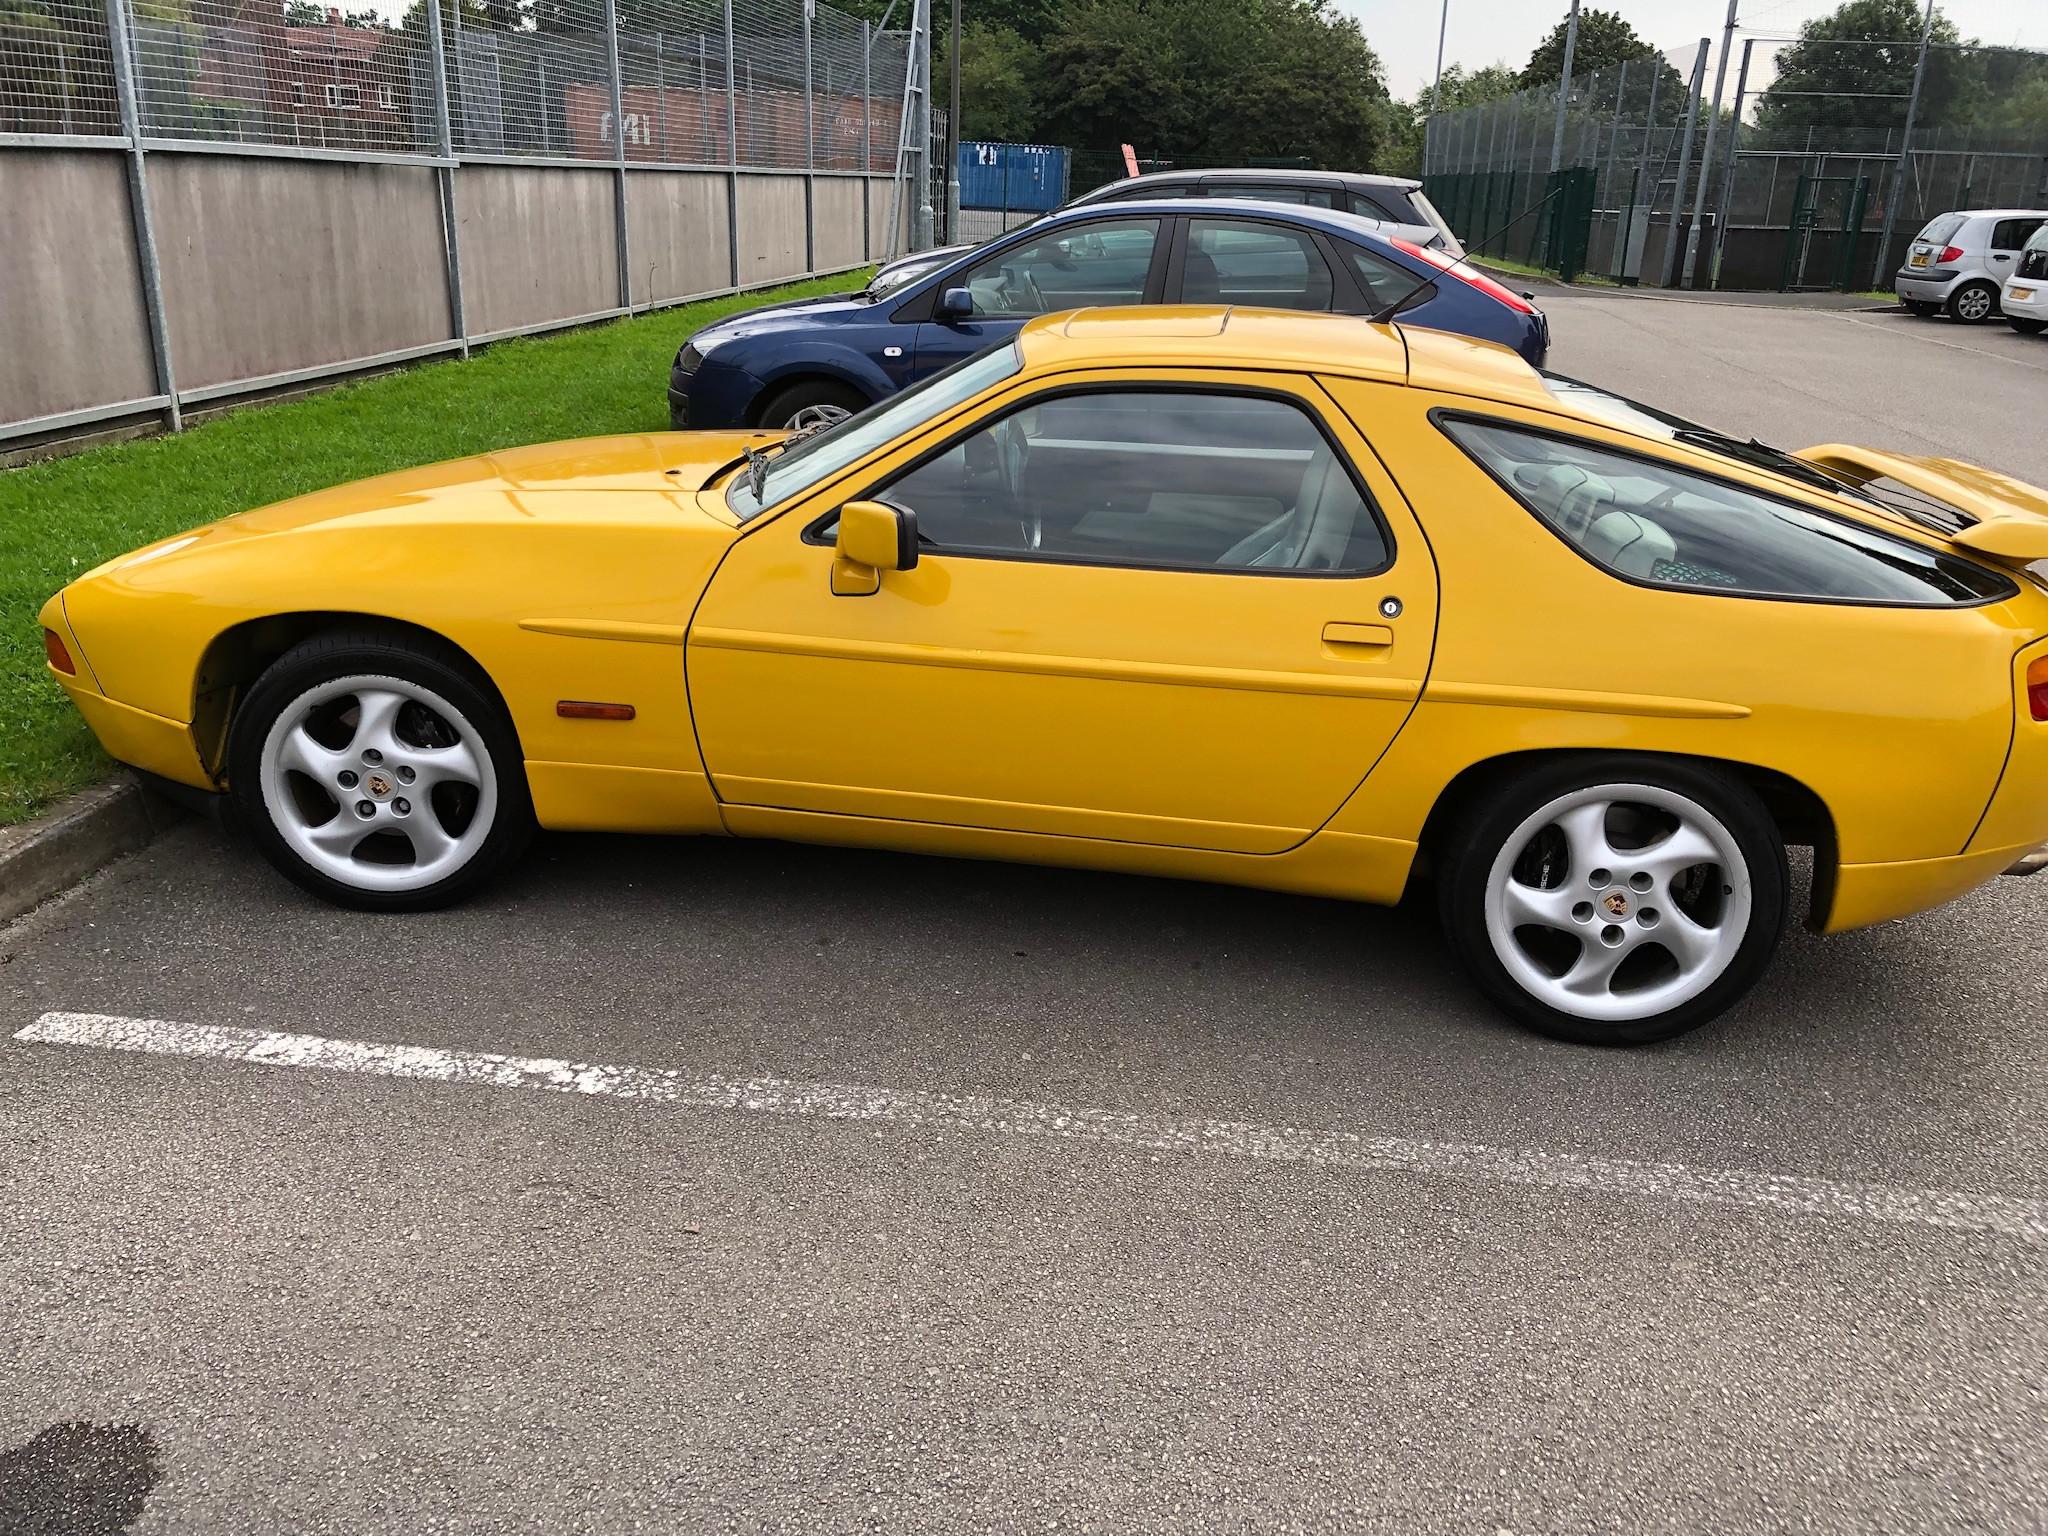 Porsche 928 S4 Hire Macclesfield